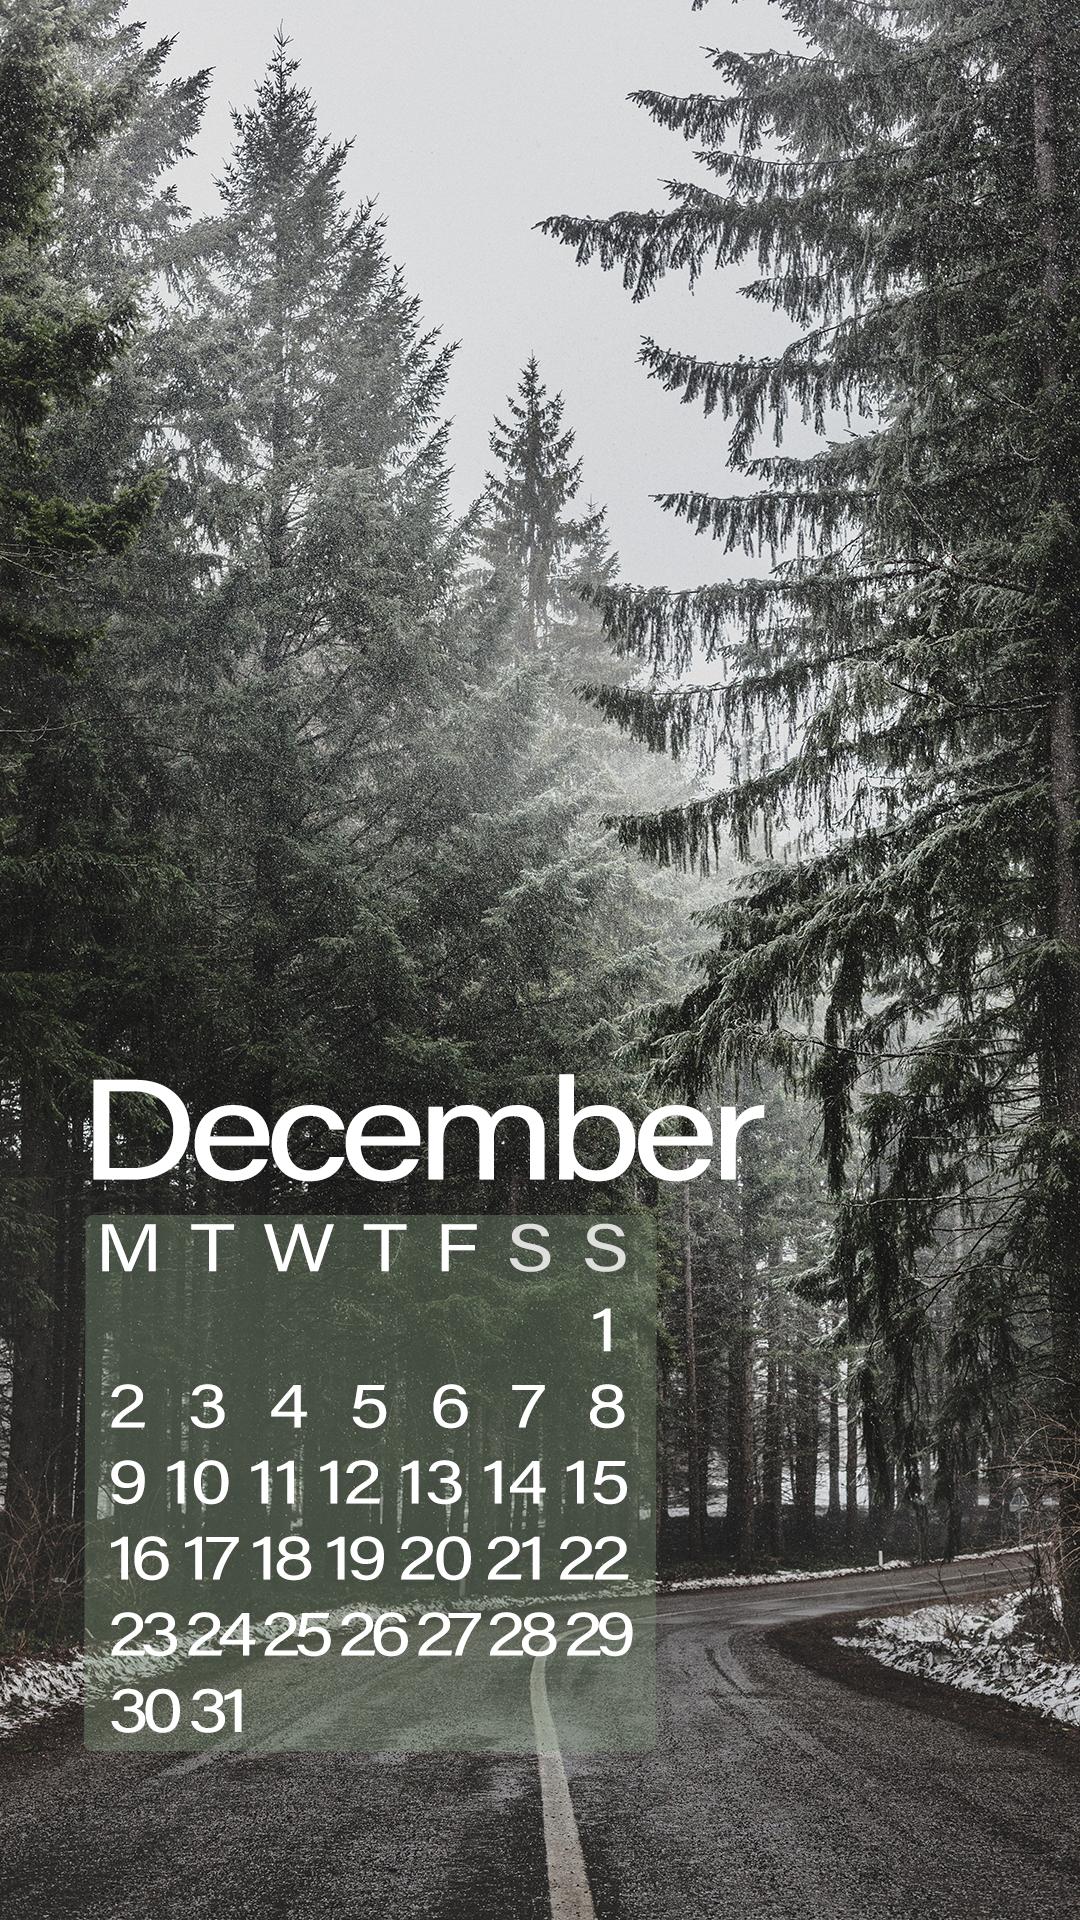 december winter 2019 forest road phone wallpaper green